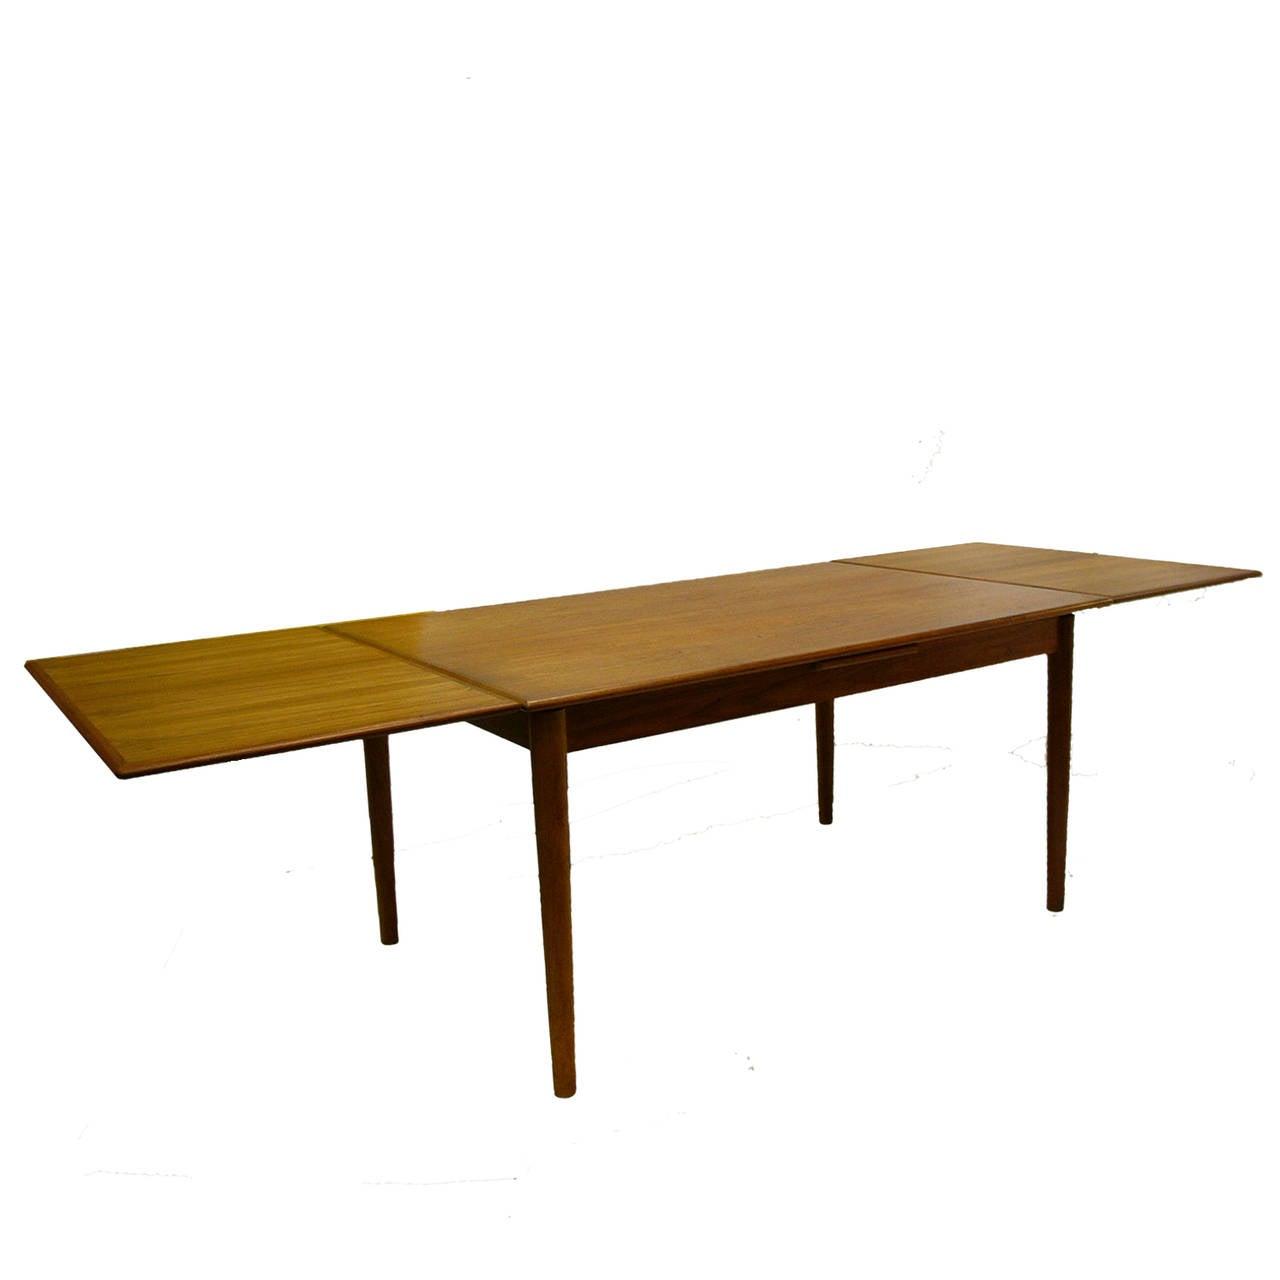 Teak Extension Dining Table